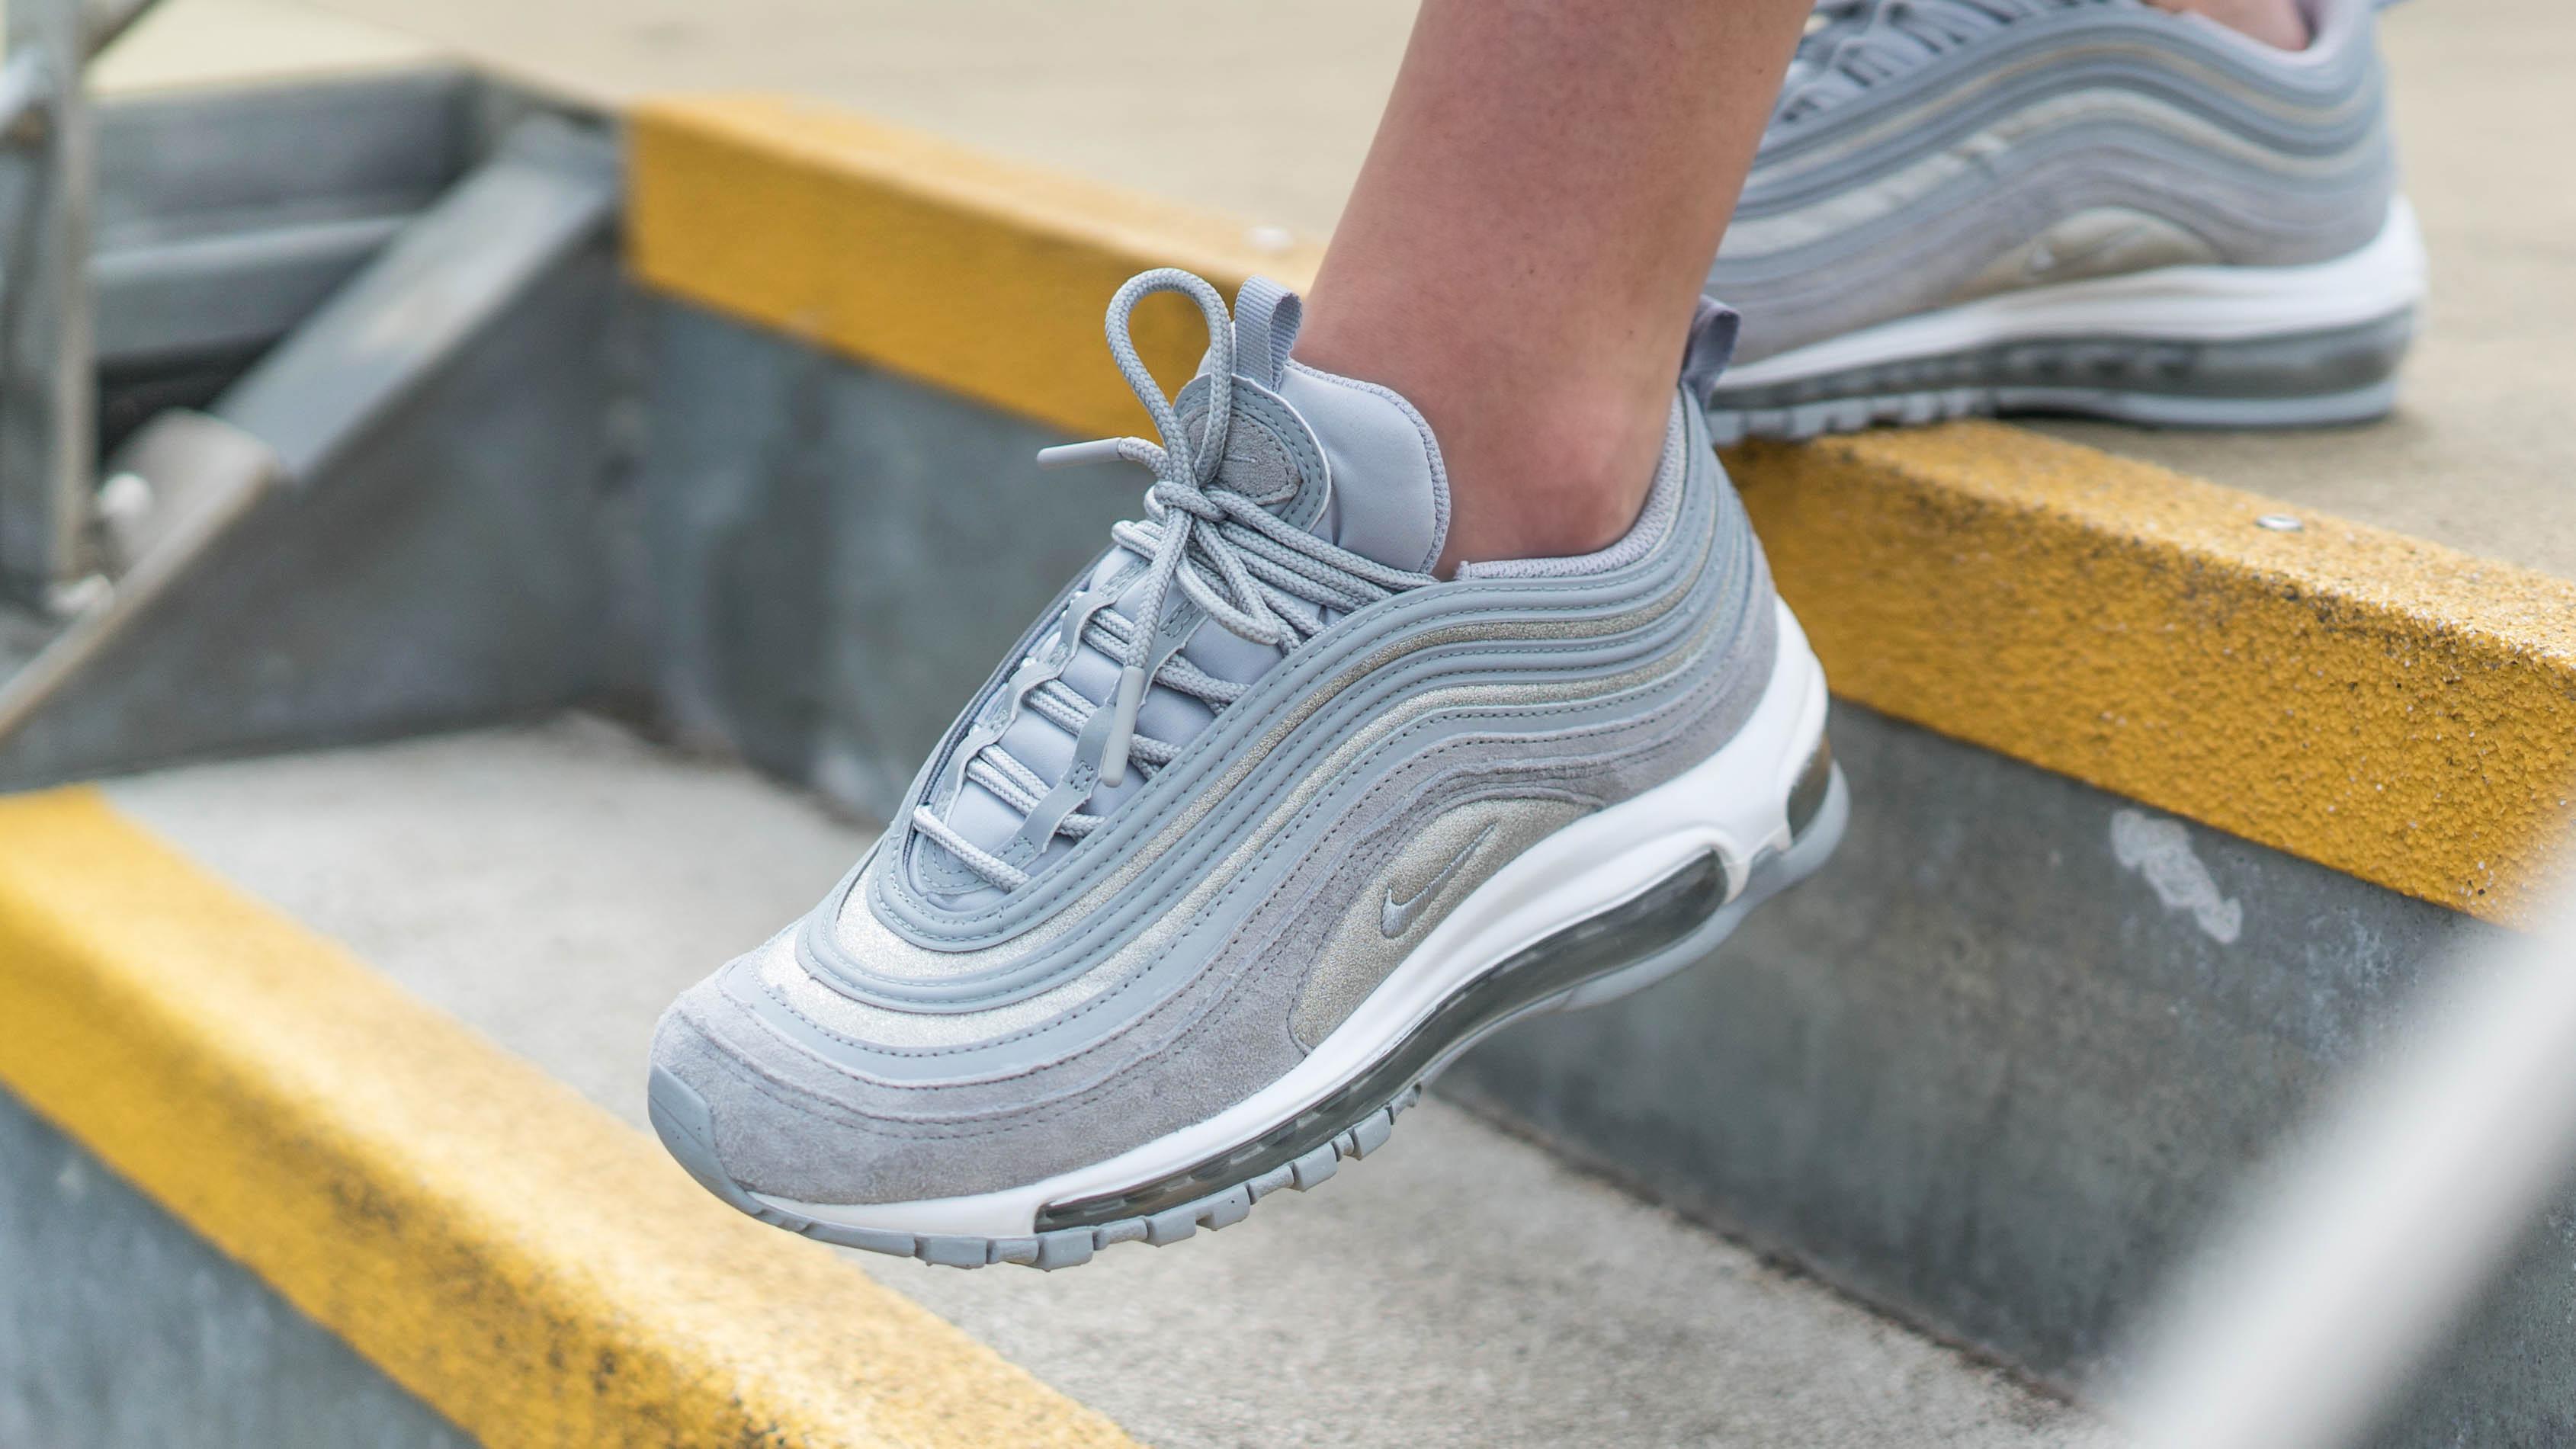 nike air max 97 og grey silver glitter pack